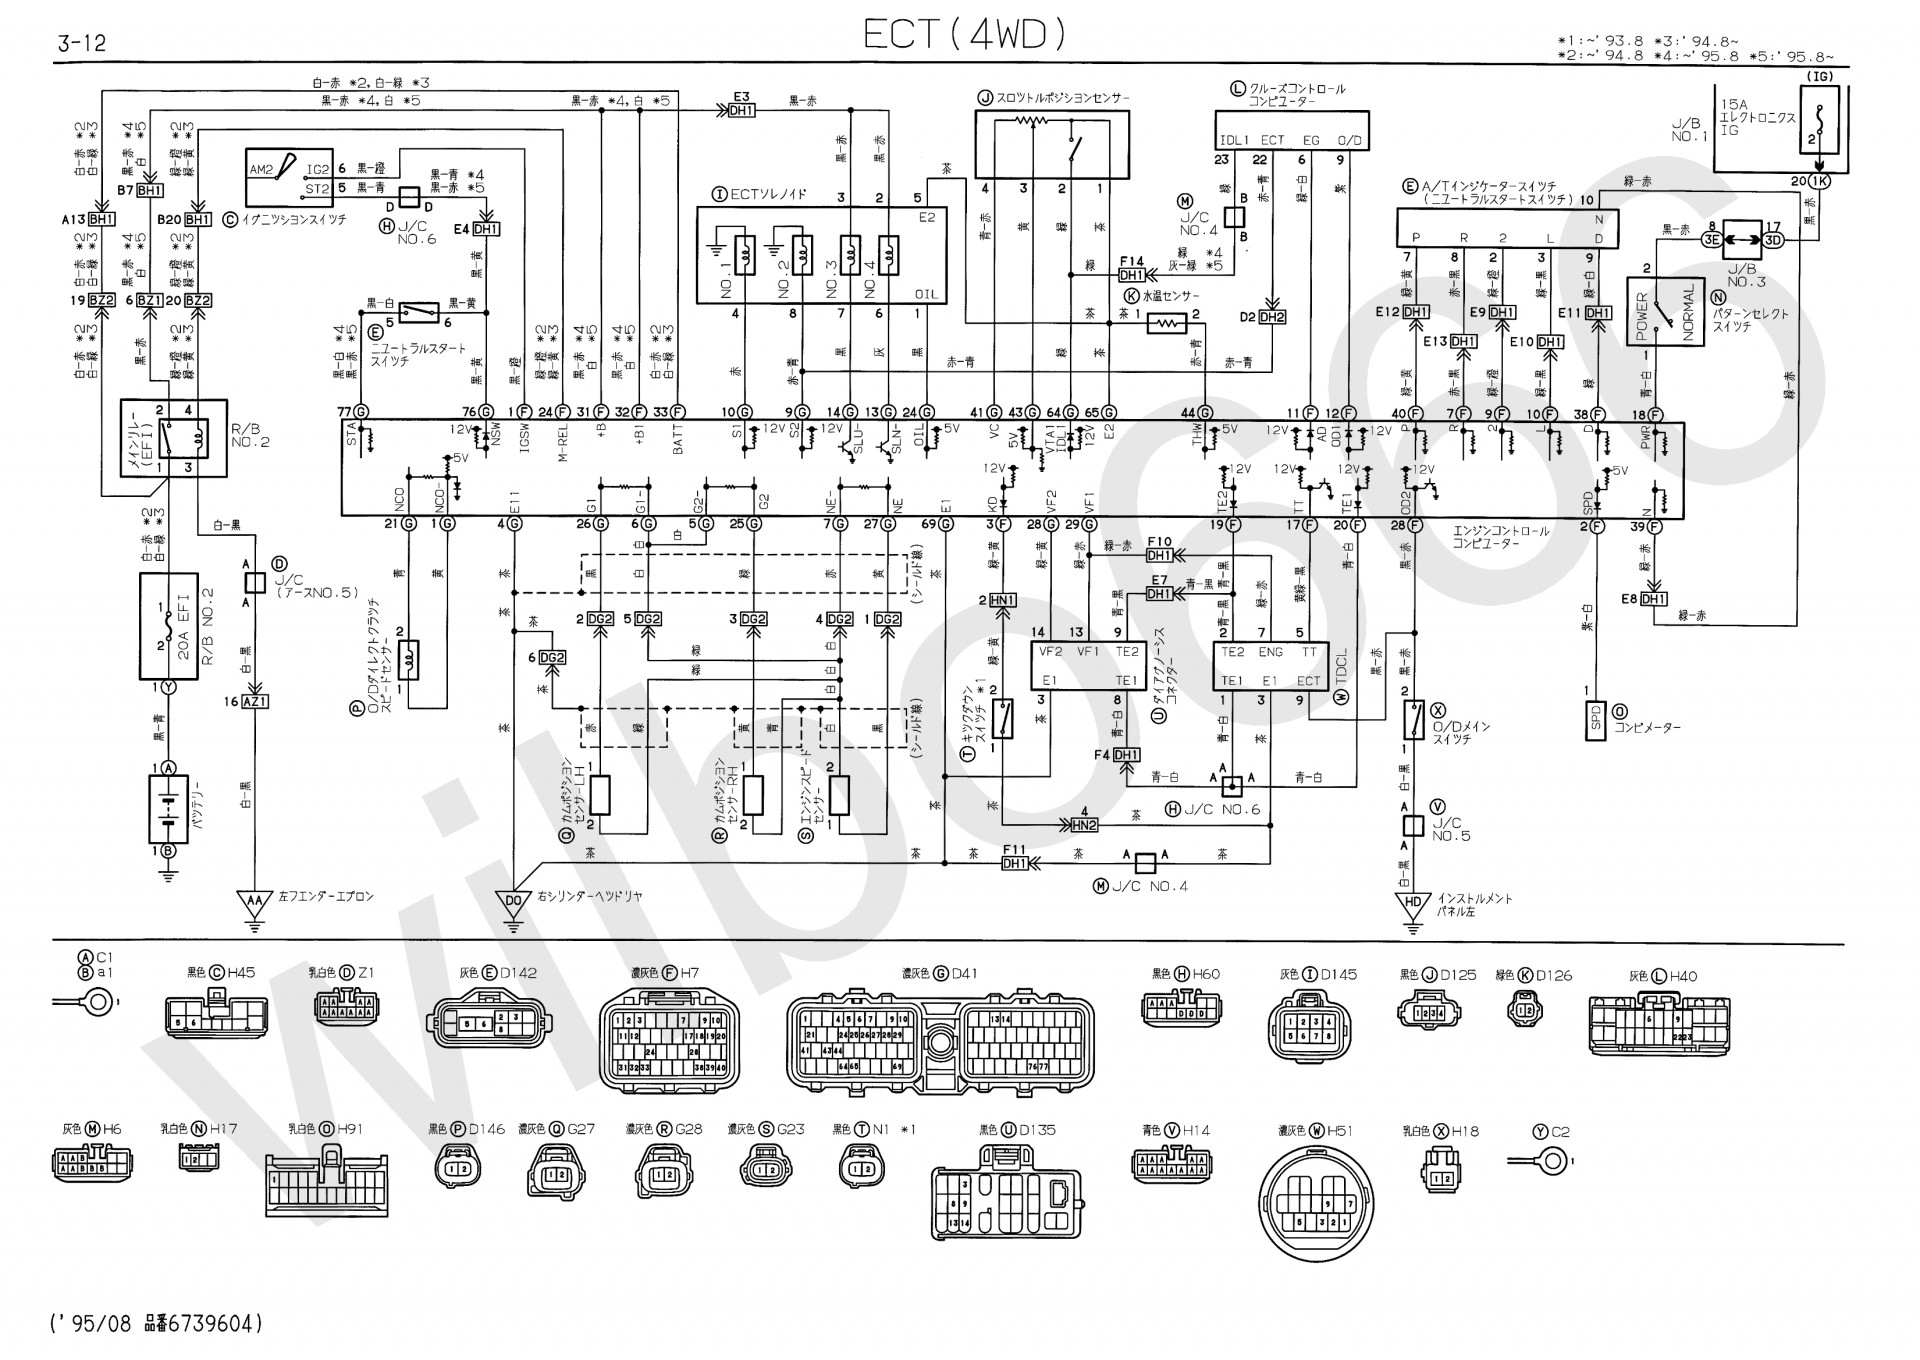 Engine Wiring Diagrams Diagram Wiring Harness Repair Guides Diagrams Autozone B16 Of Engine Wiring Diagrams